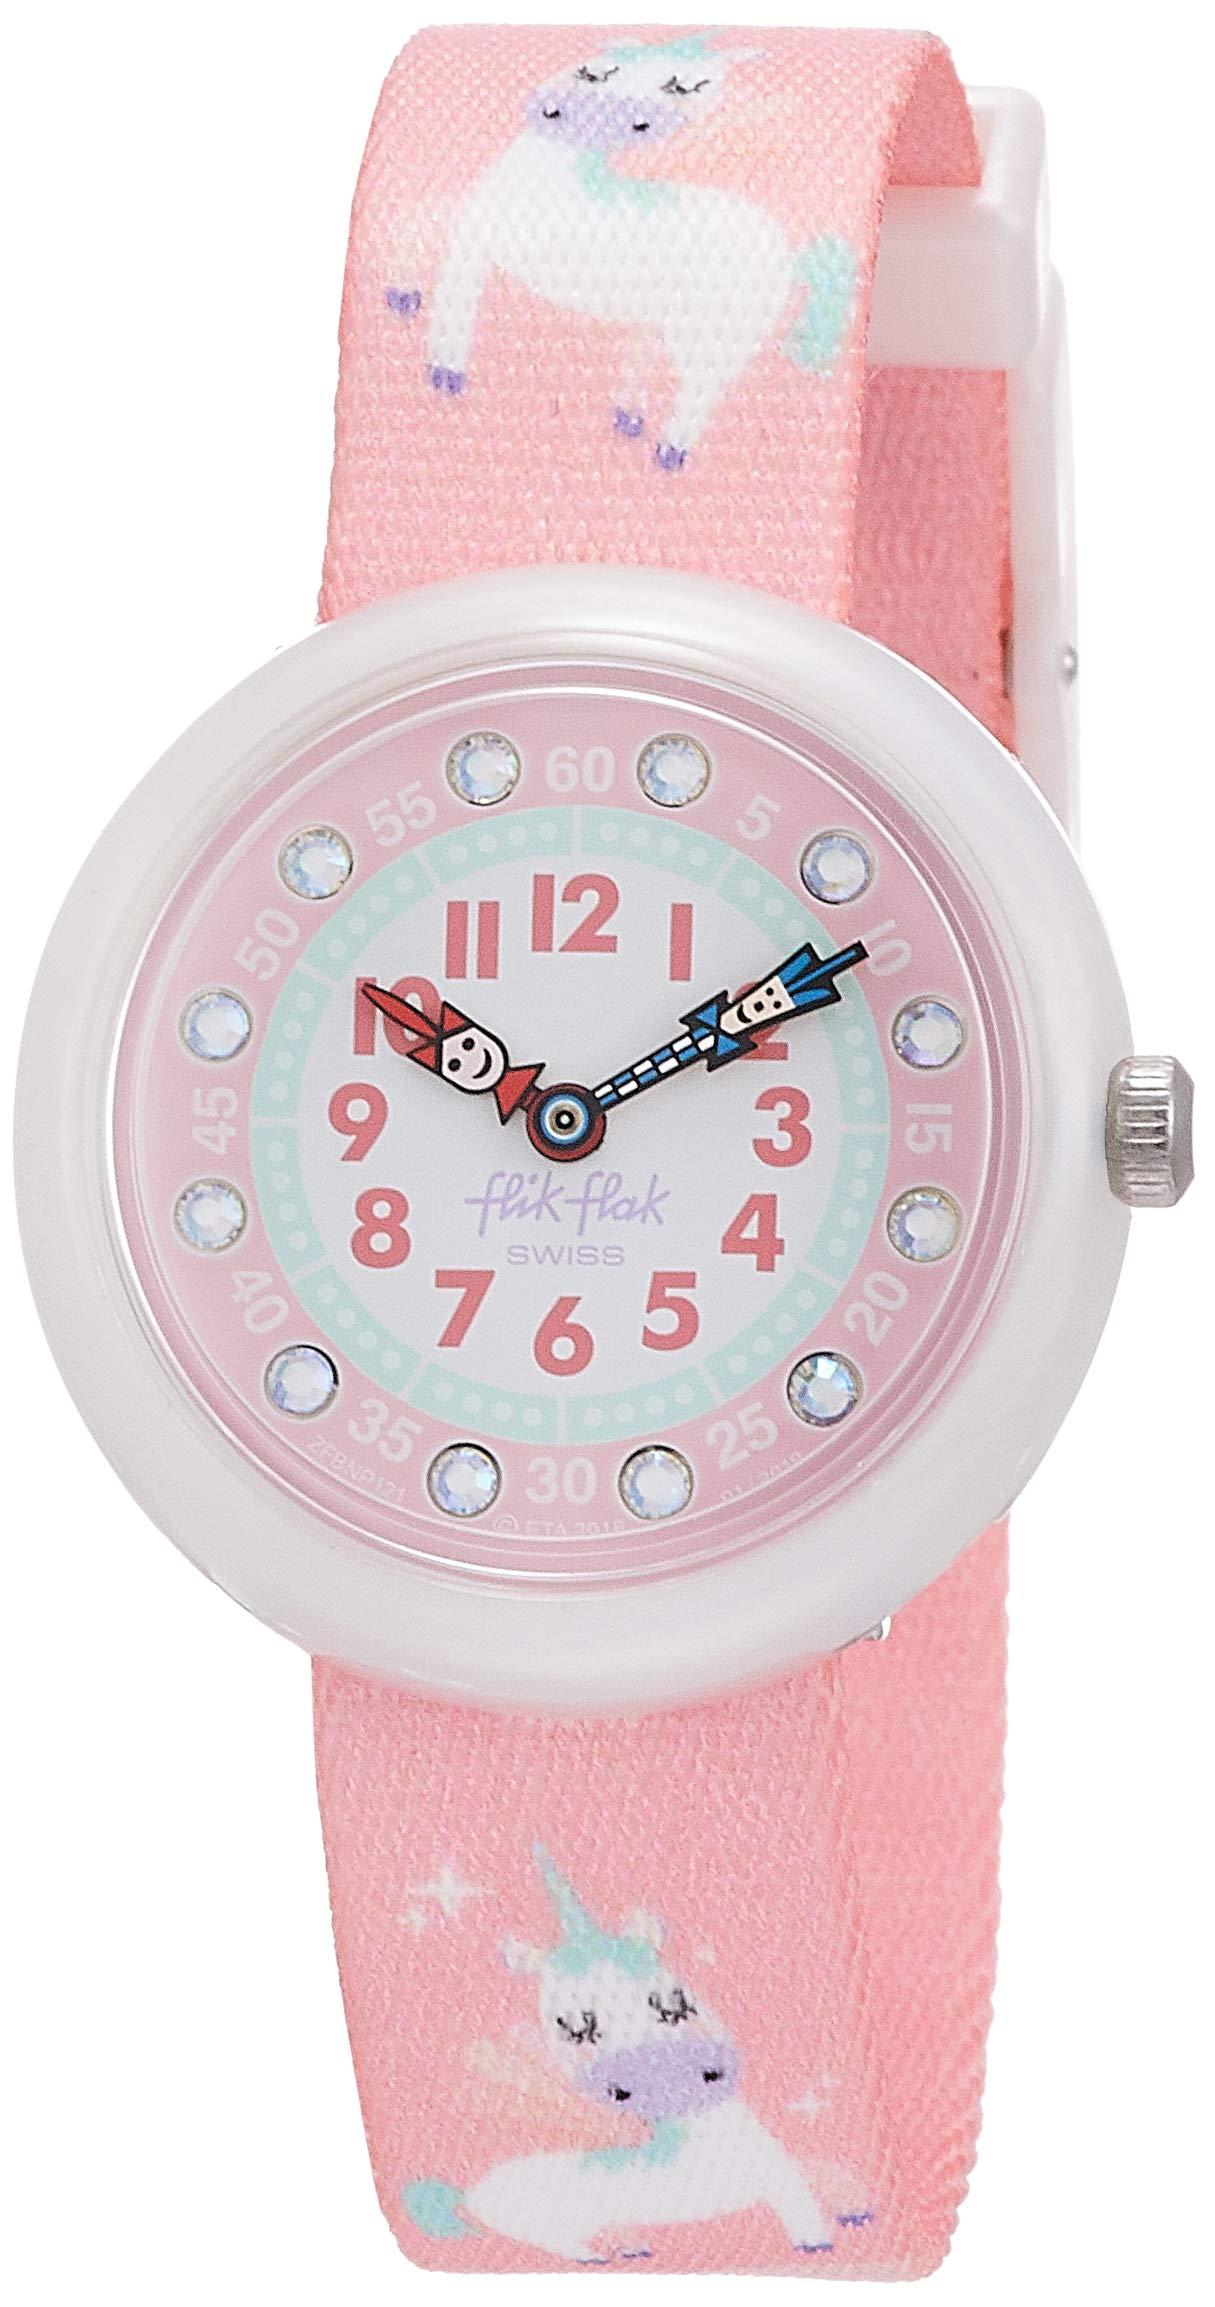 Flik Flak Kids' Quartz Nylon Strap, Pink, 14 Casual Watch (Model: ZFBNP121) by Flik Flak